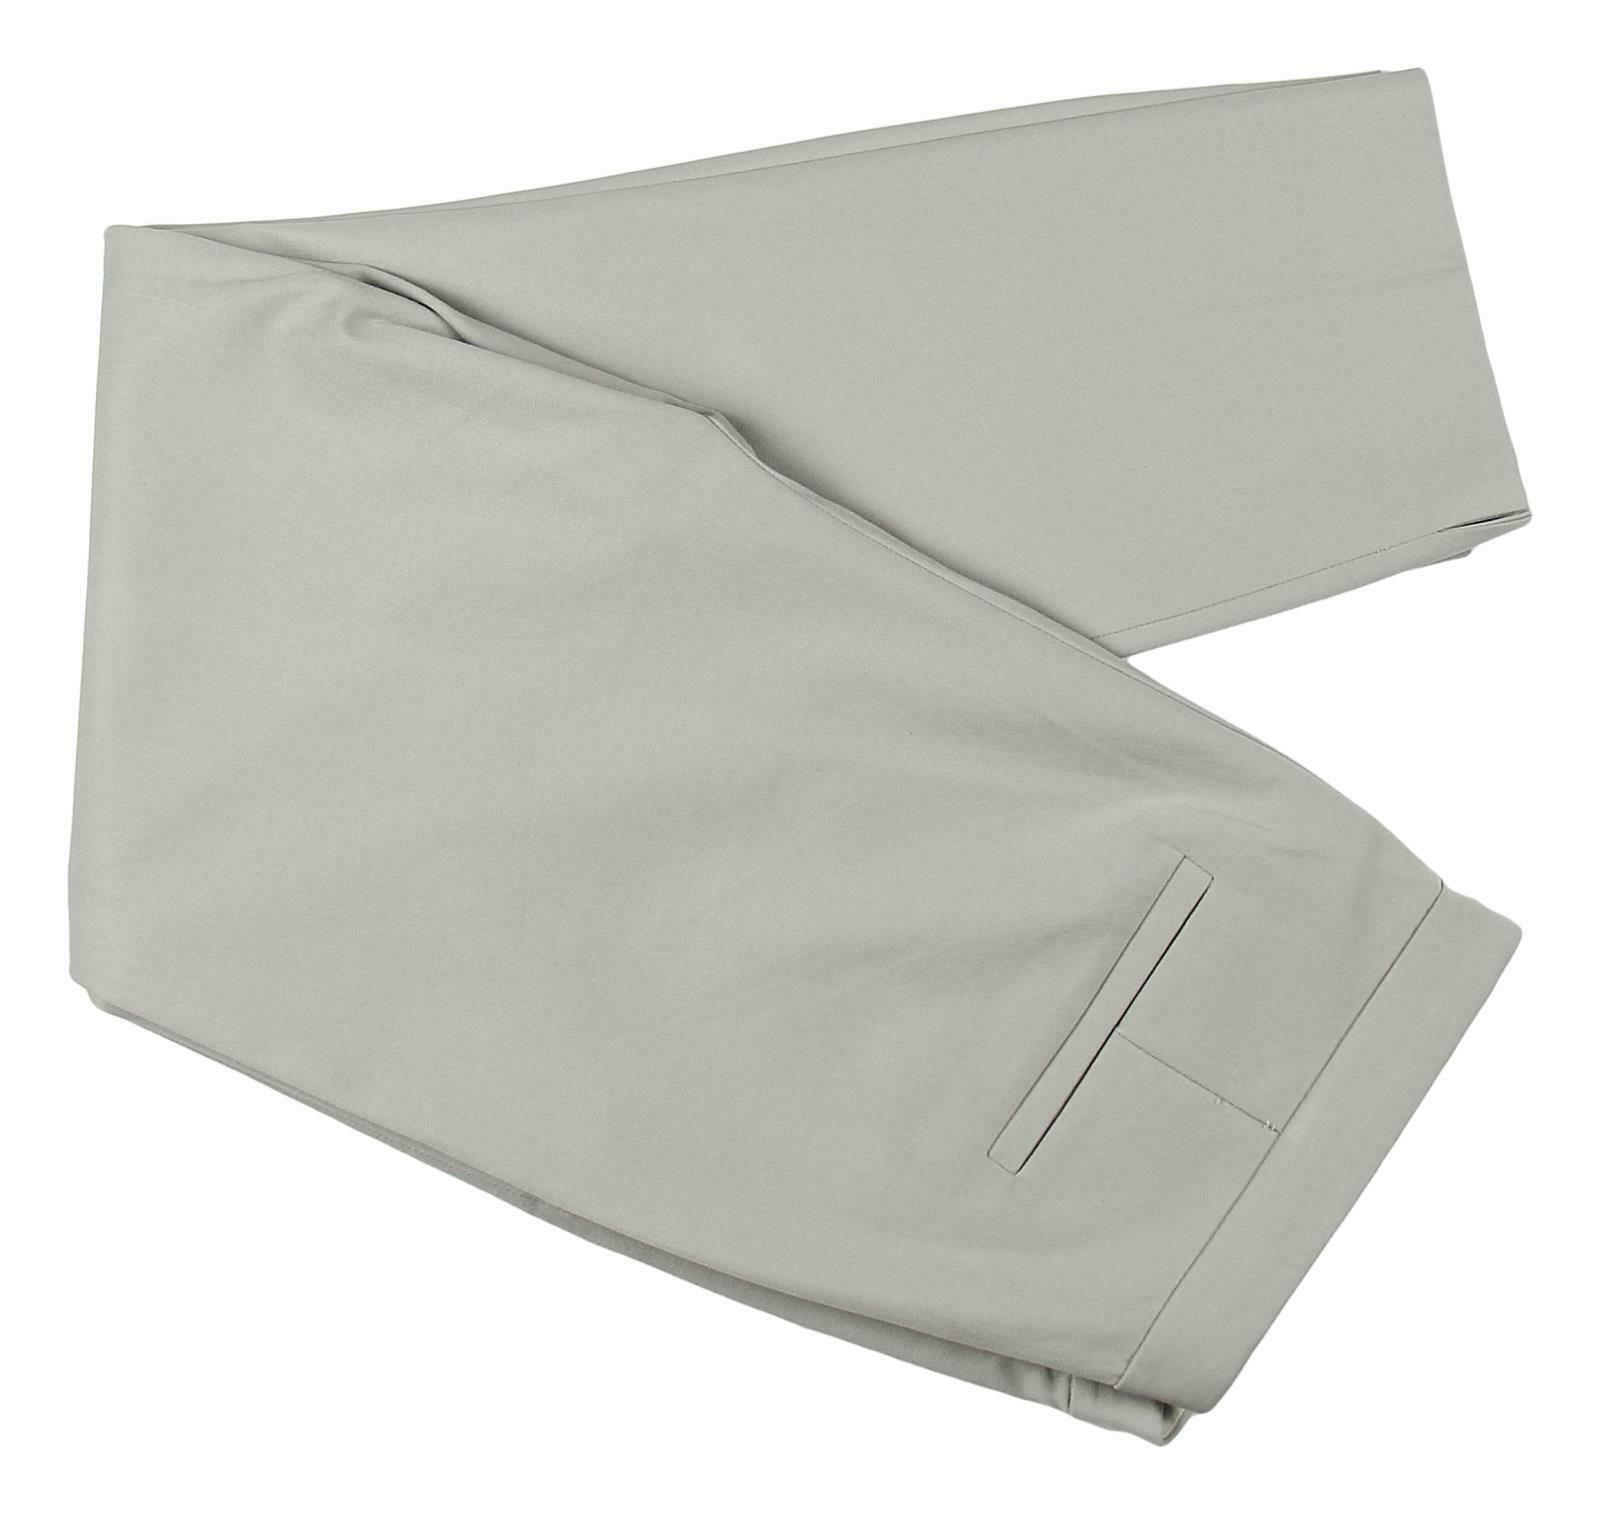 J Crew Womens Martie Slim Crop Ankle Pant in Bi-Stretch Cotton 10 Gray B8521